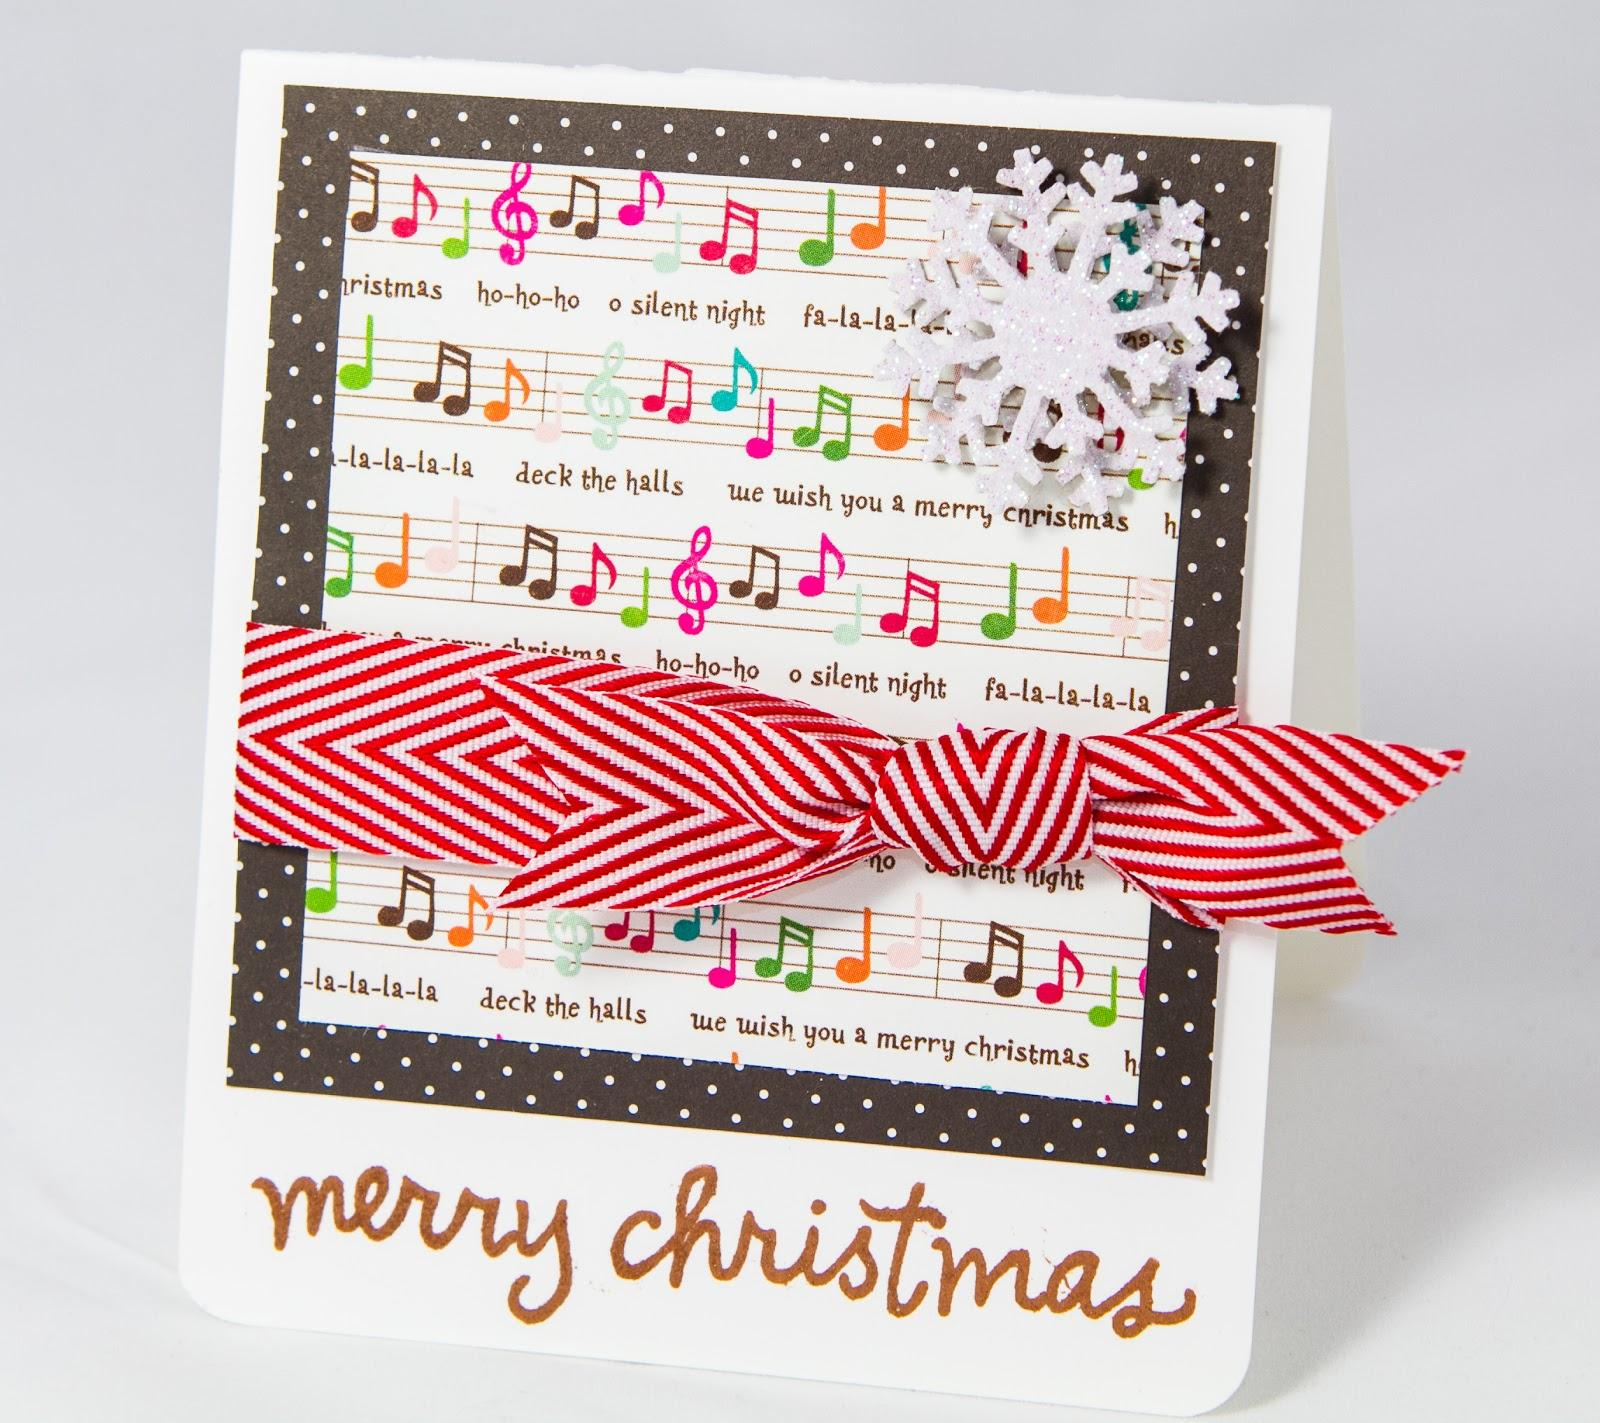 ♫ ♪ ♫ ♪ Notové vianoce ♫ ♪ ♫ ♪ - Obrázok č. 45